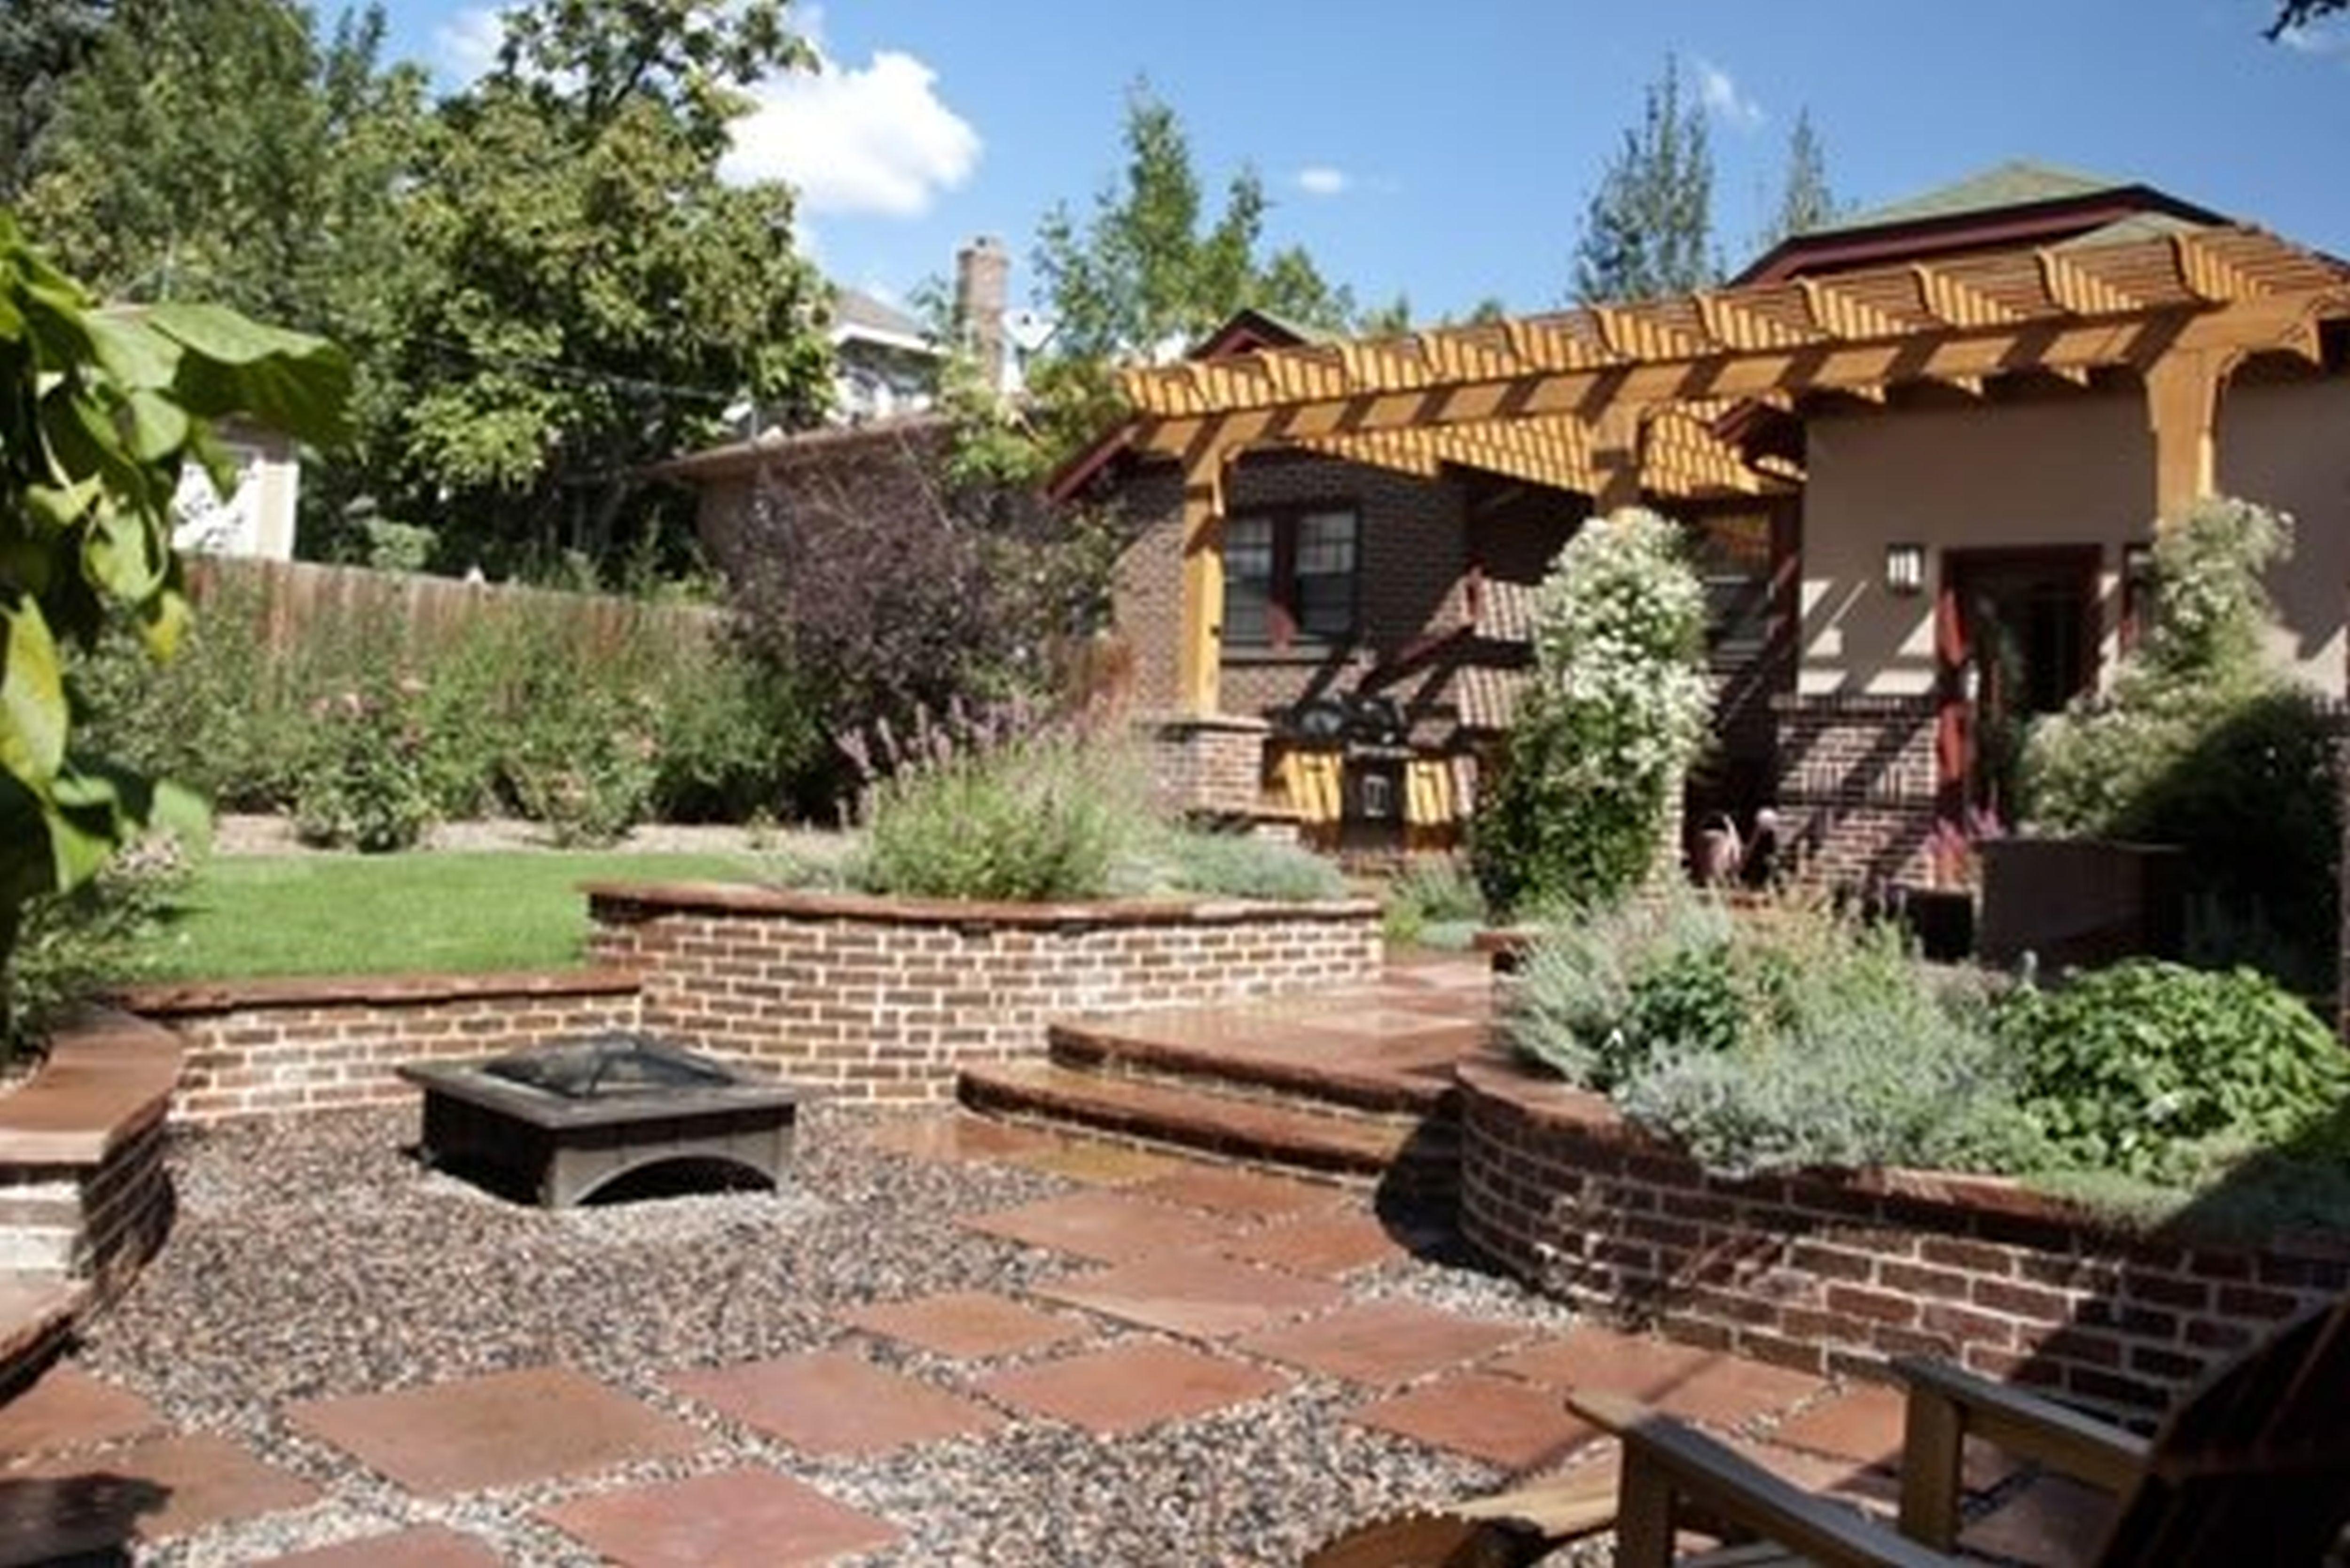 10 Ways How to Improve Backyard Deck Ideas | Desert ... on Desert Landscape Ideas For Backyards id=29768